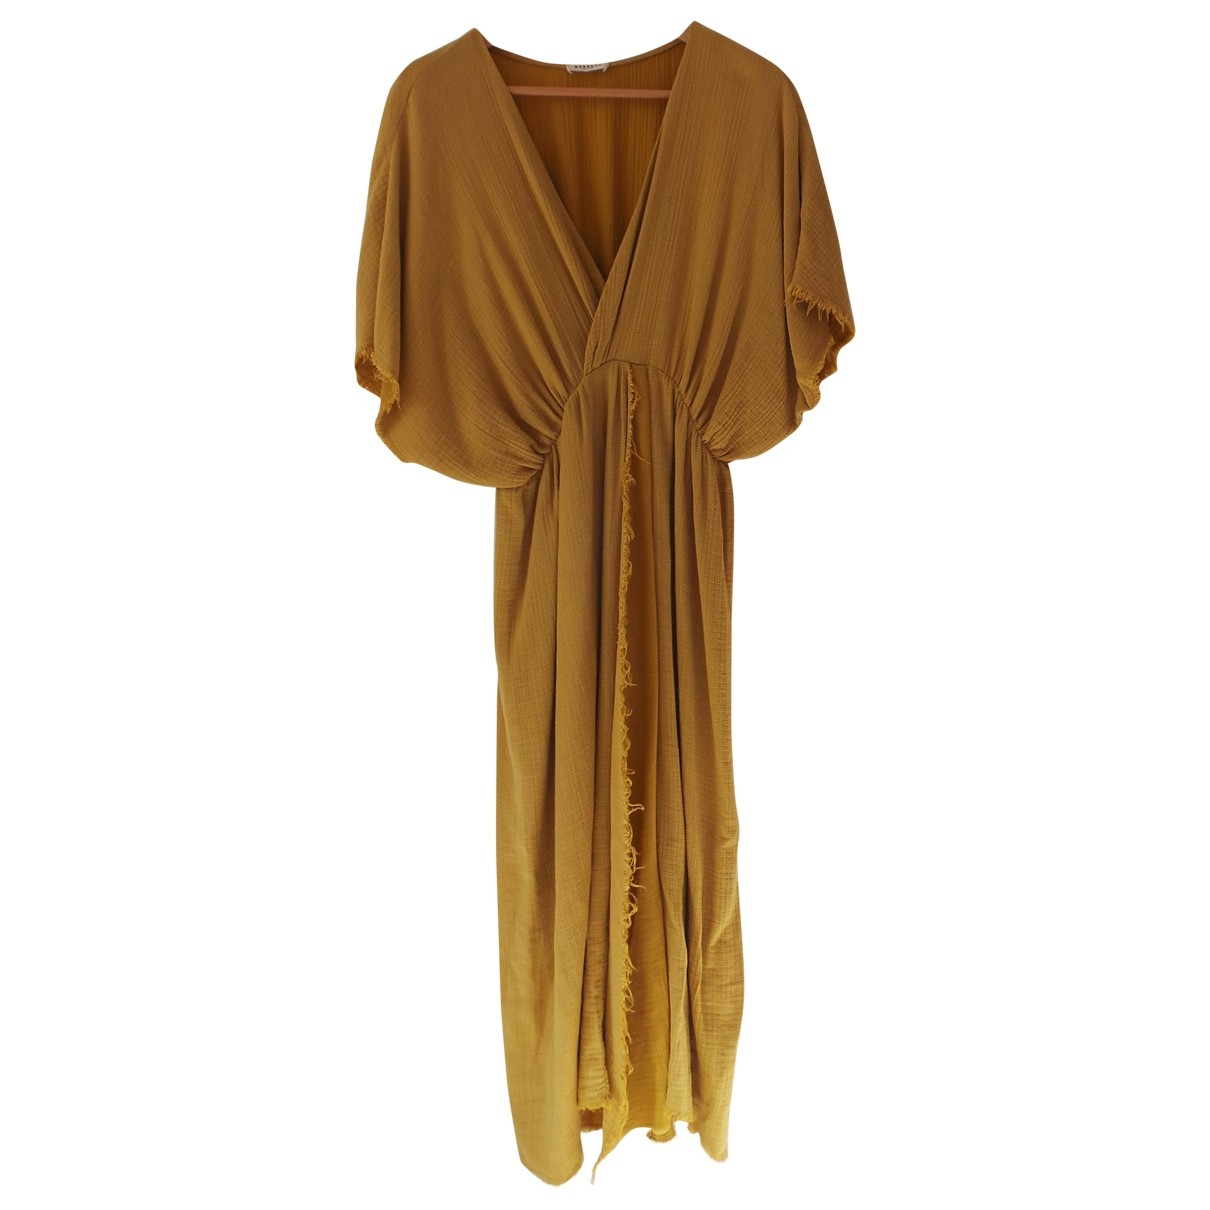 Masscob \N Yellow Cotton dress for Women M International